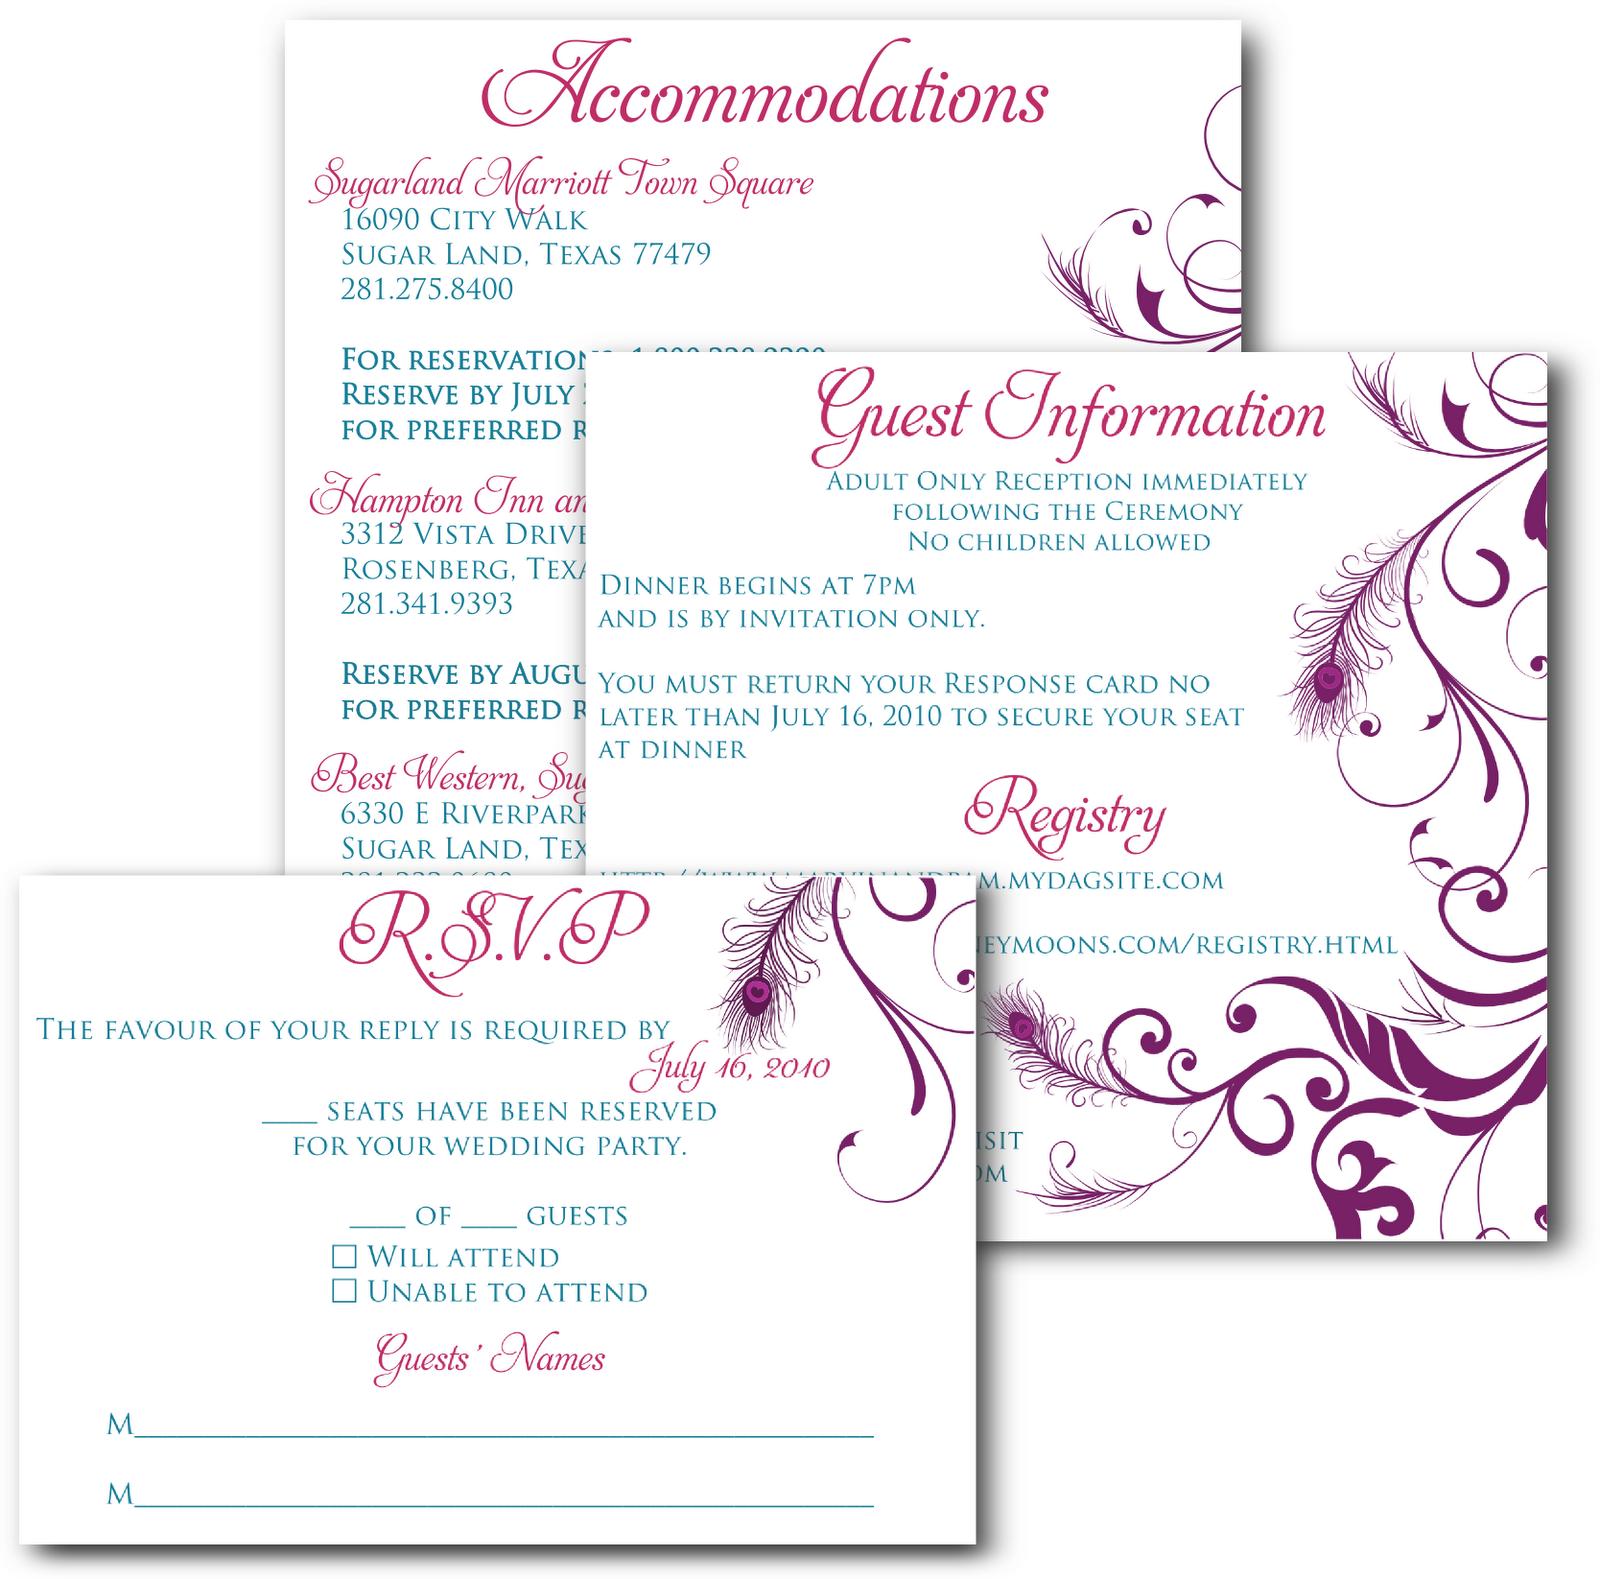 Signatures By Sarah: Wedding Invitation Inserts For Pamela